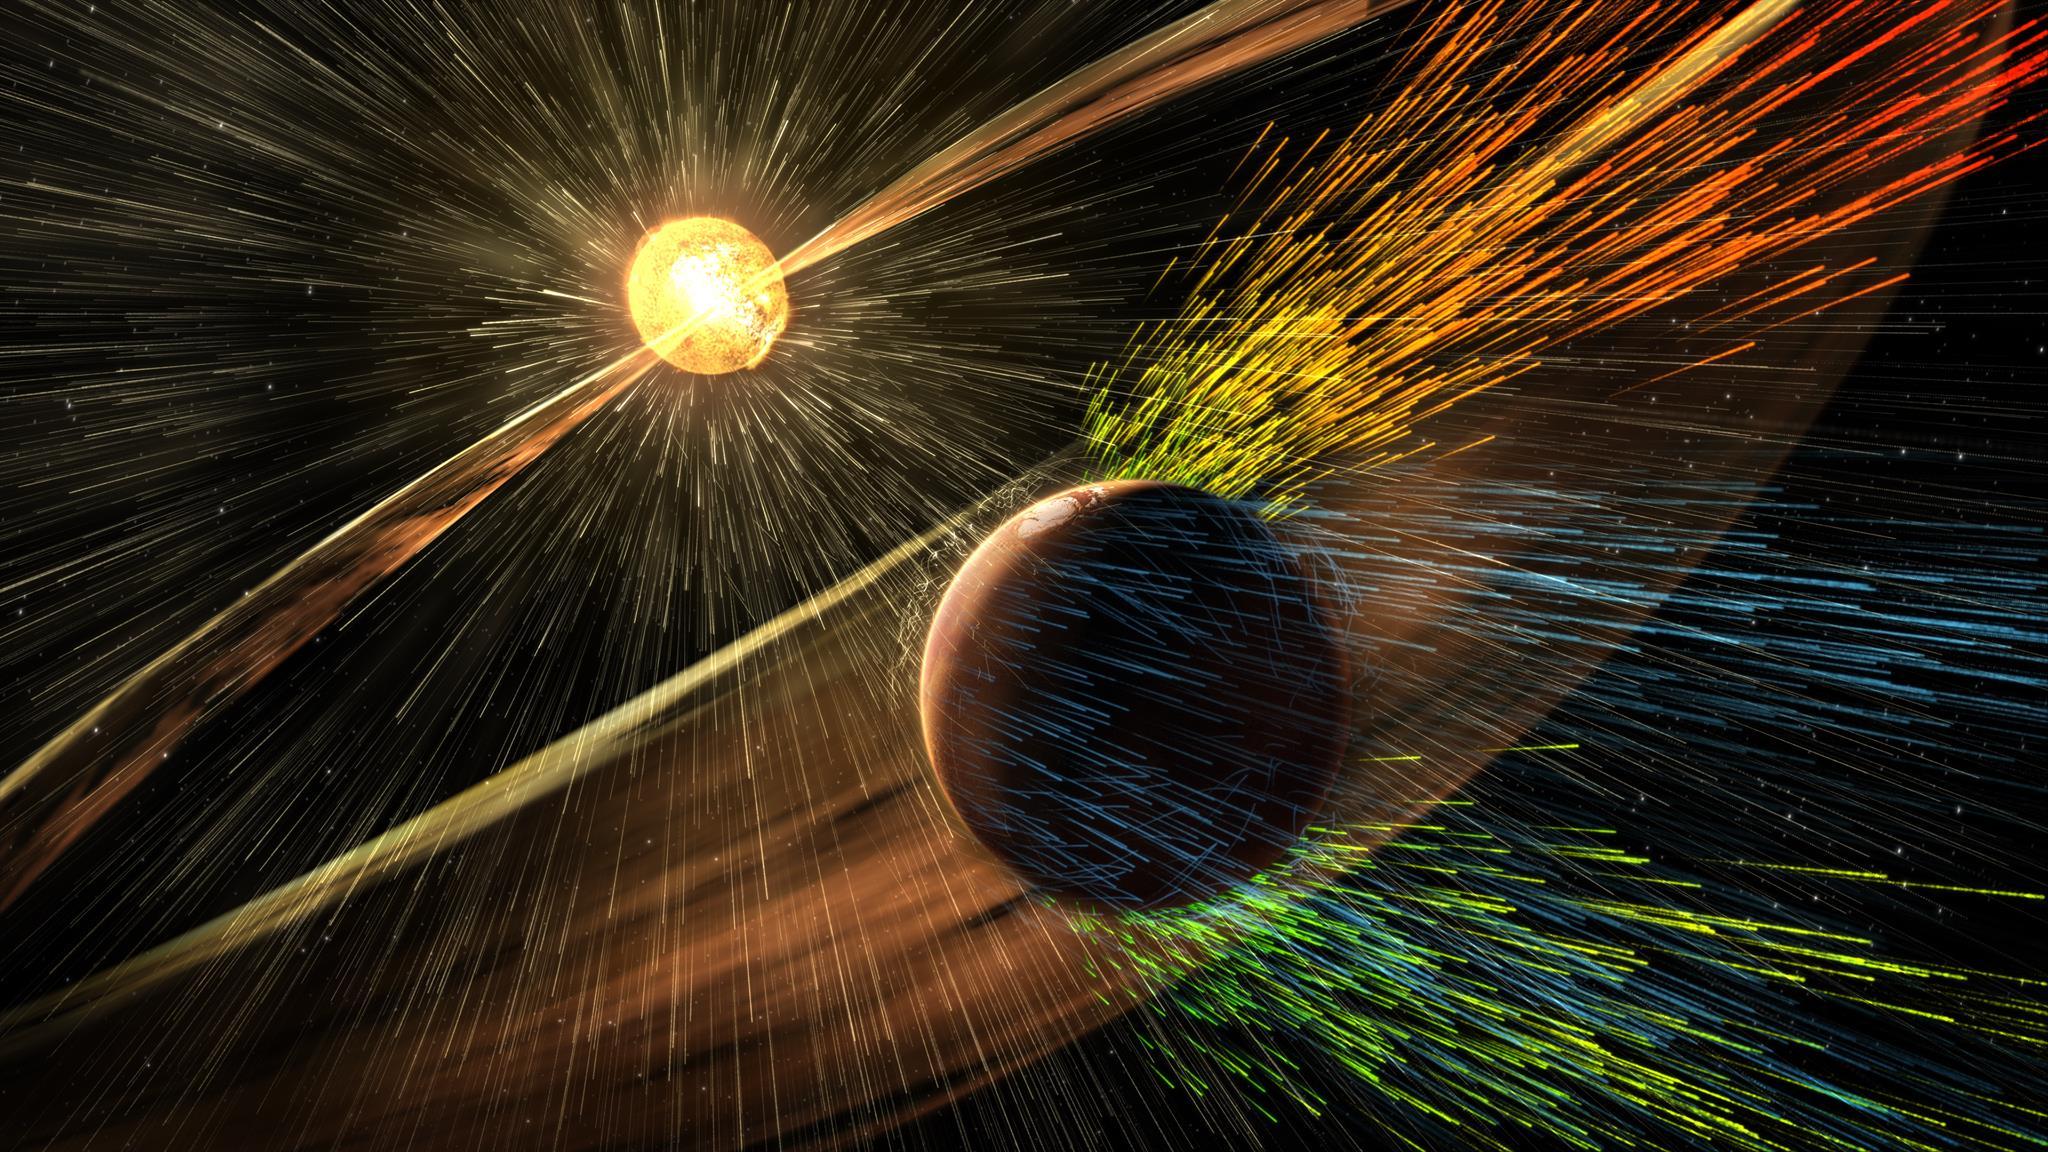 http://www.meteoweb.eu/wp-content/uploads/2015/11/Marte-00.jpg